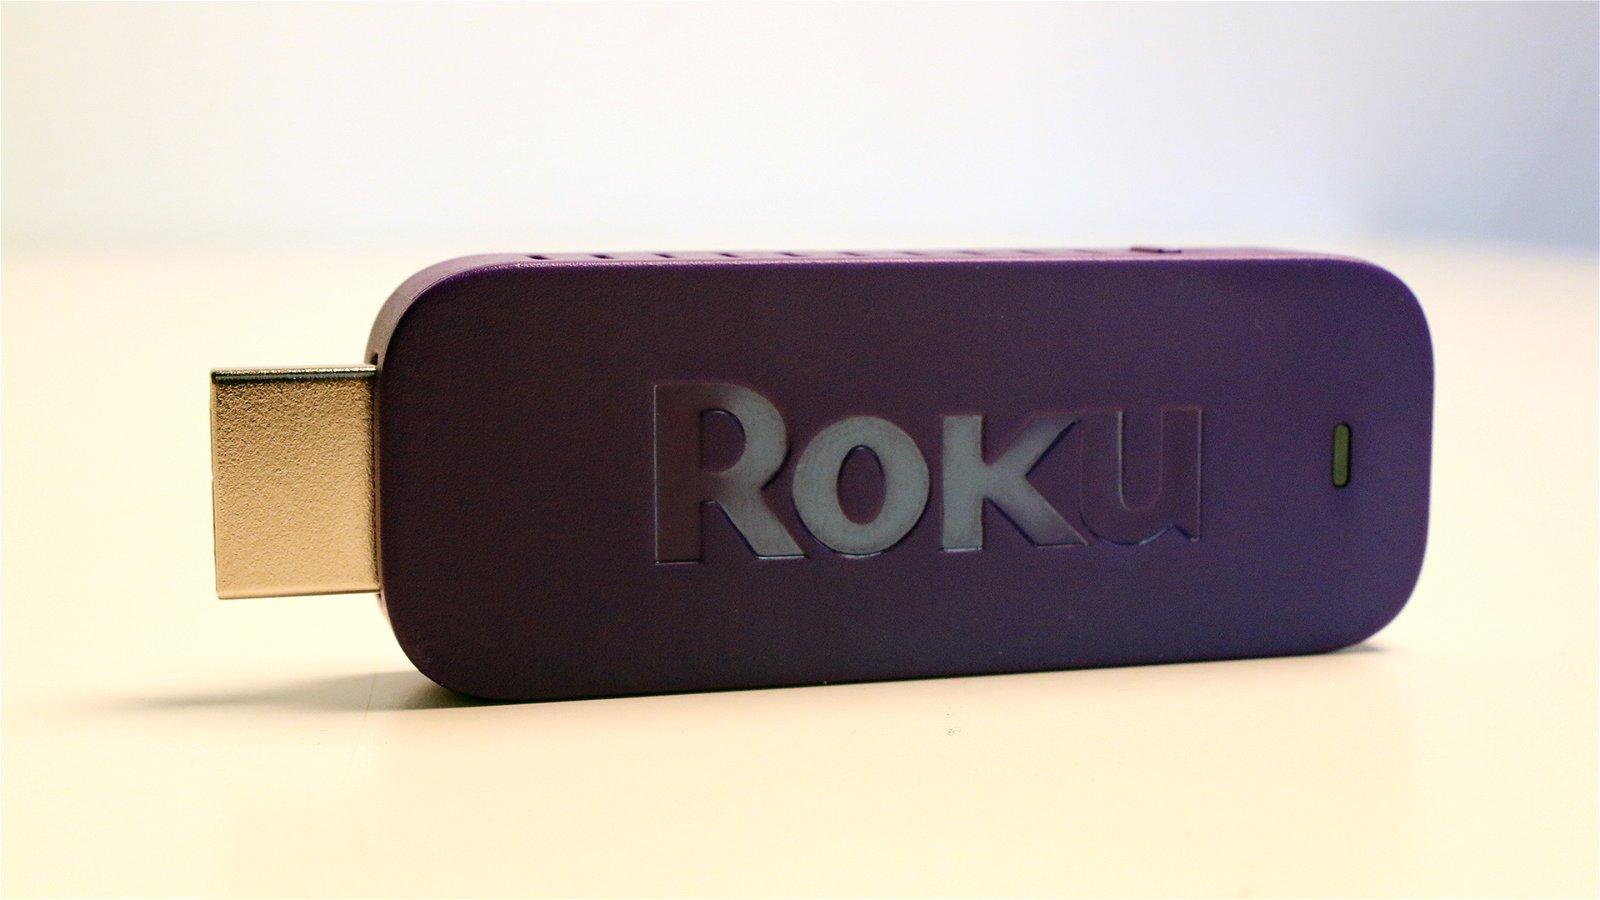 Roku Streaming Stick (Hardware) Review 2